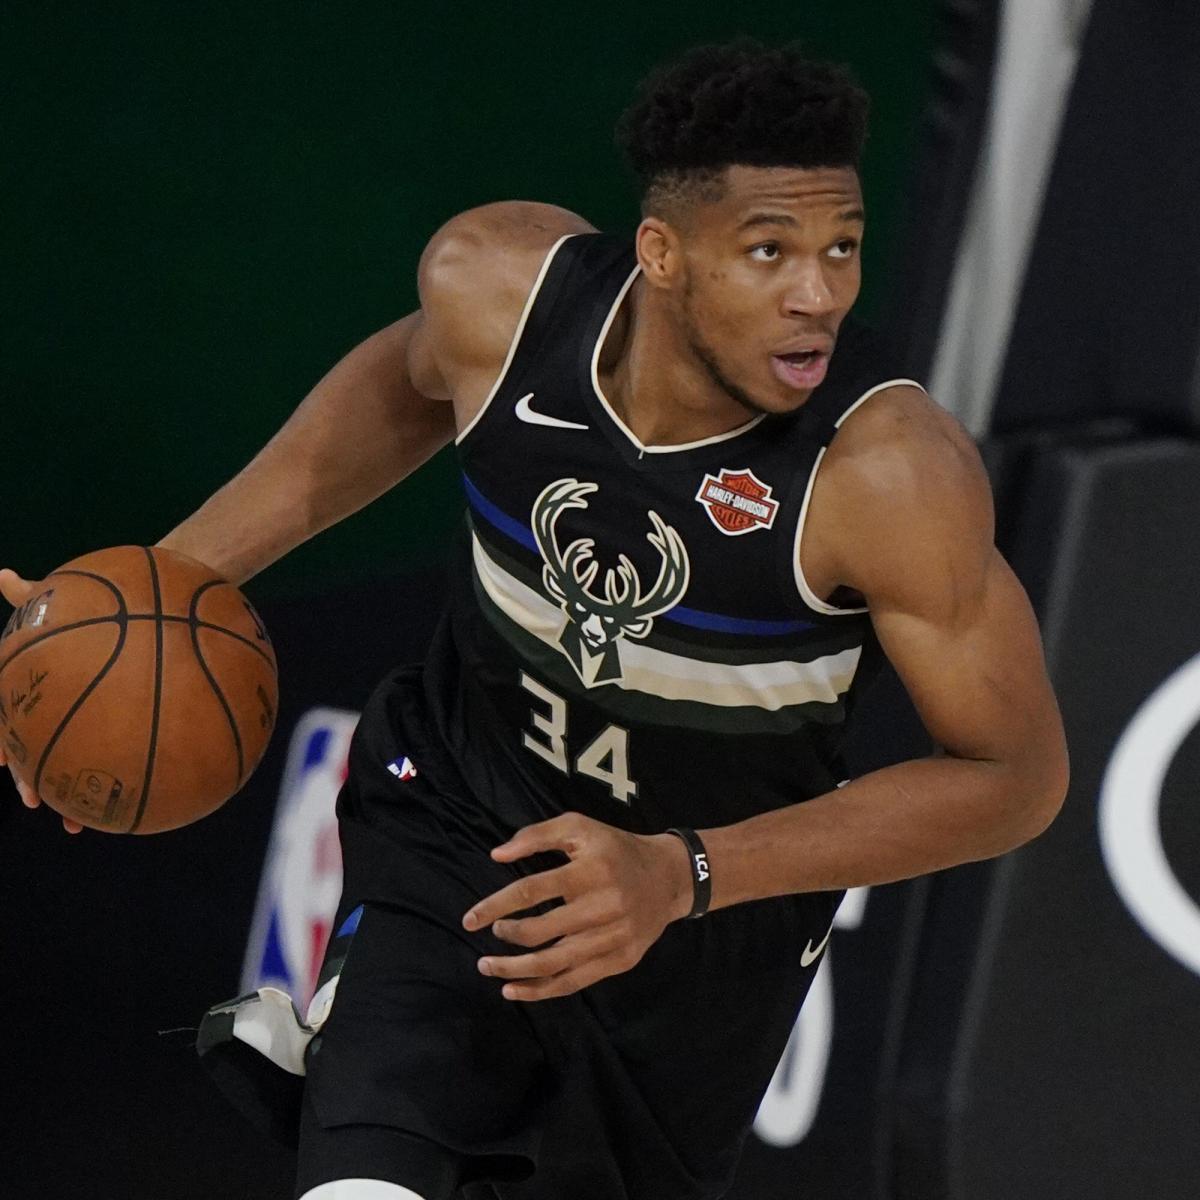 5 Ways the Next NBA Season Will Impact 2021 Free Agency